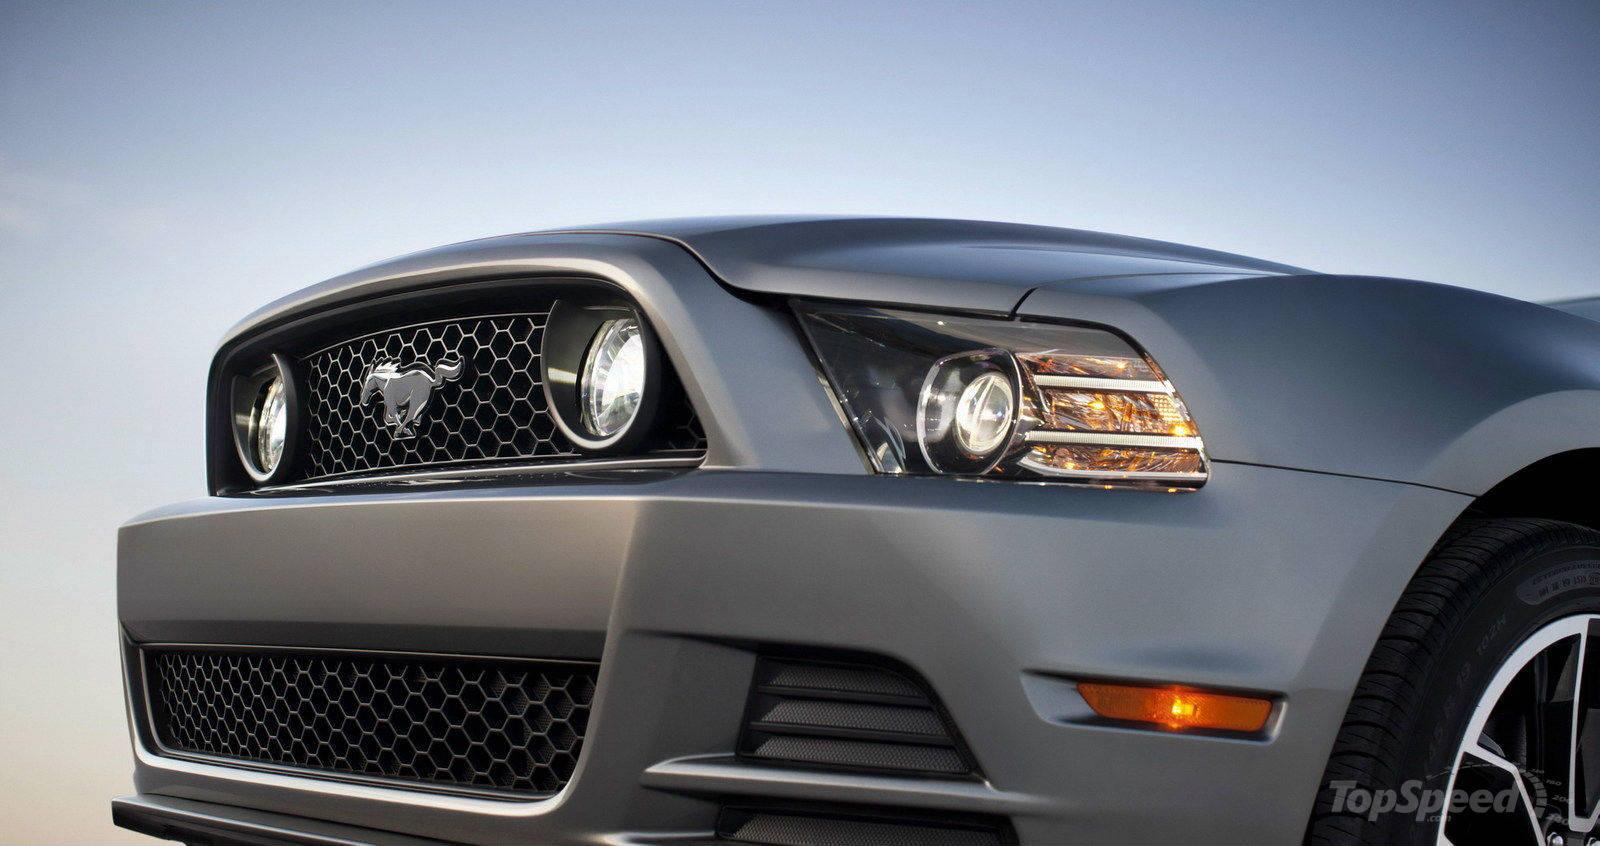 The Thunderbirds Edition 2014 Ford Mustang GT in BriefNO Car NO Fun